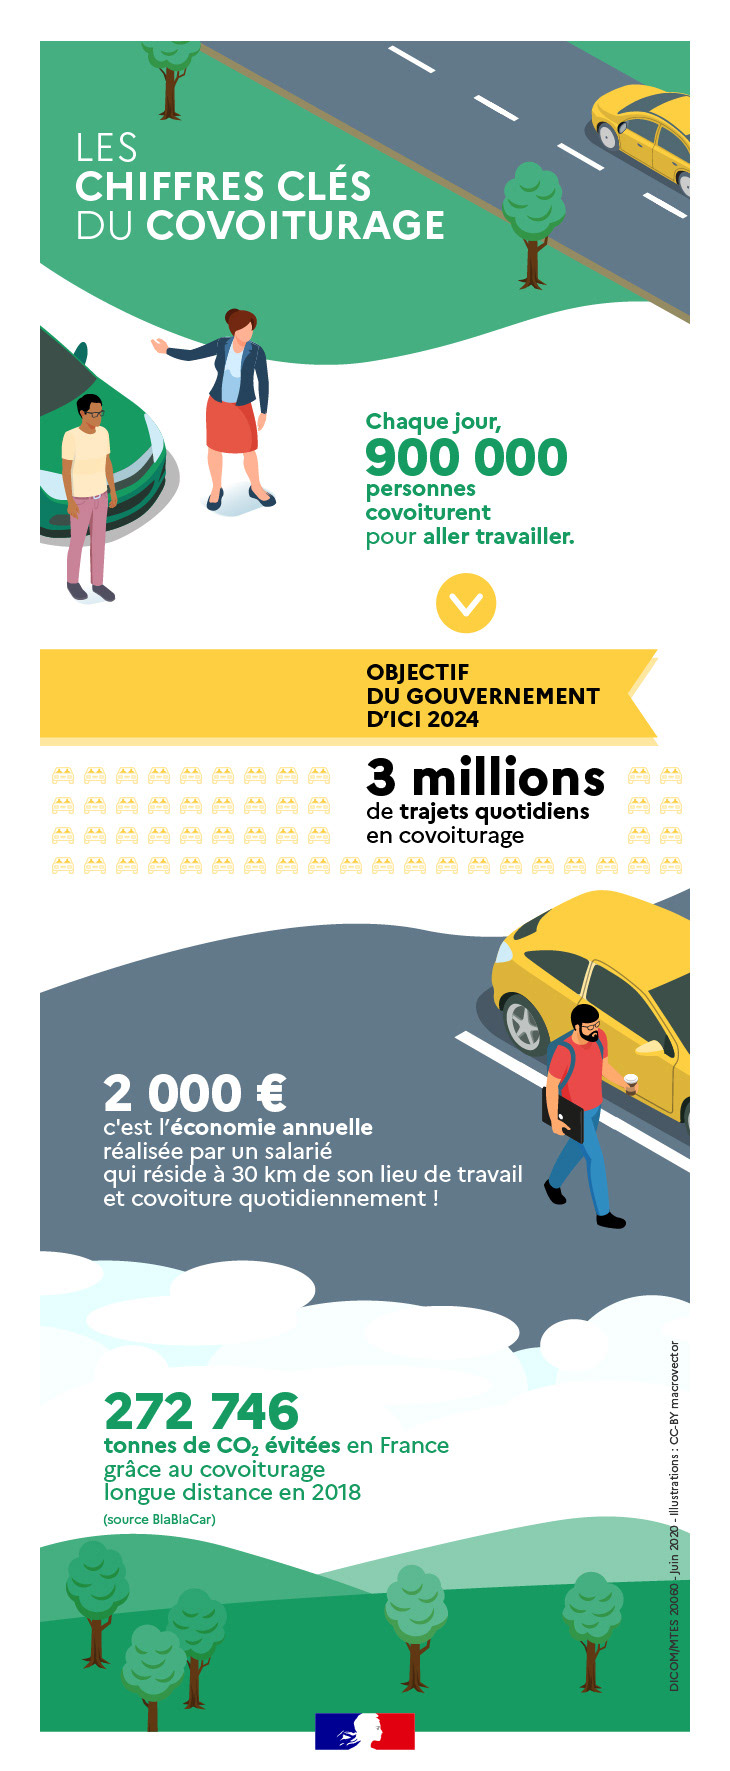 car Car Sharing covoiturage datavisualisation DATAVISUALIZATION infographic Infographie mobilité mobility Transports